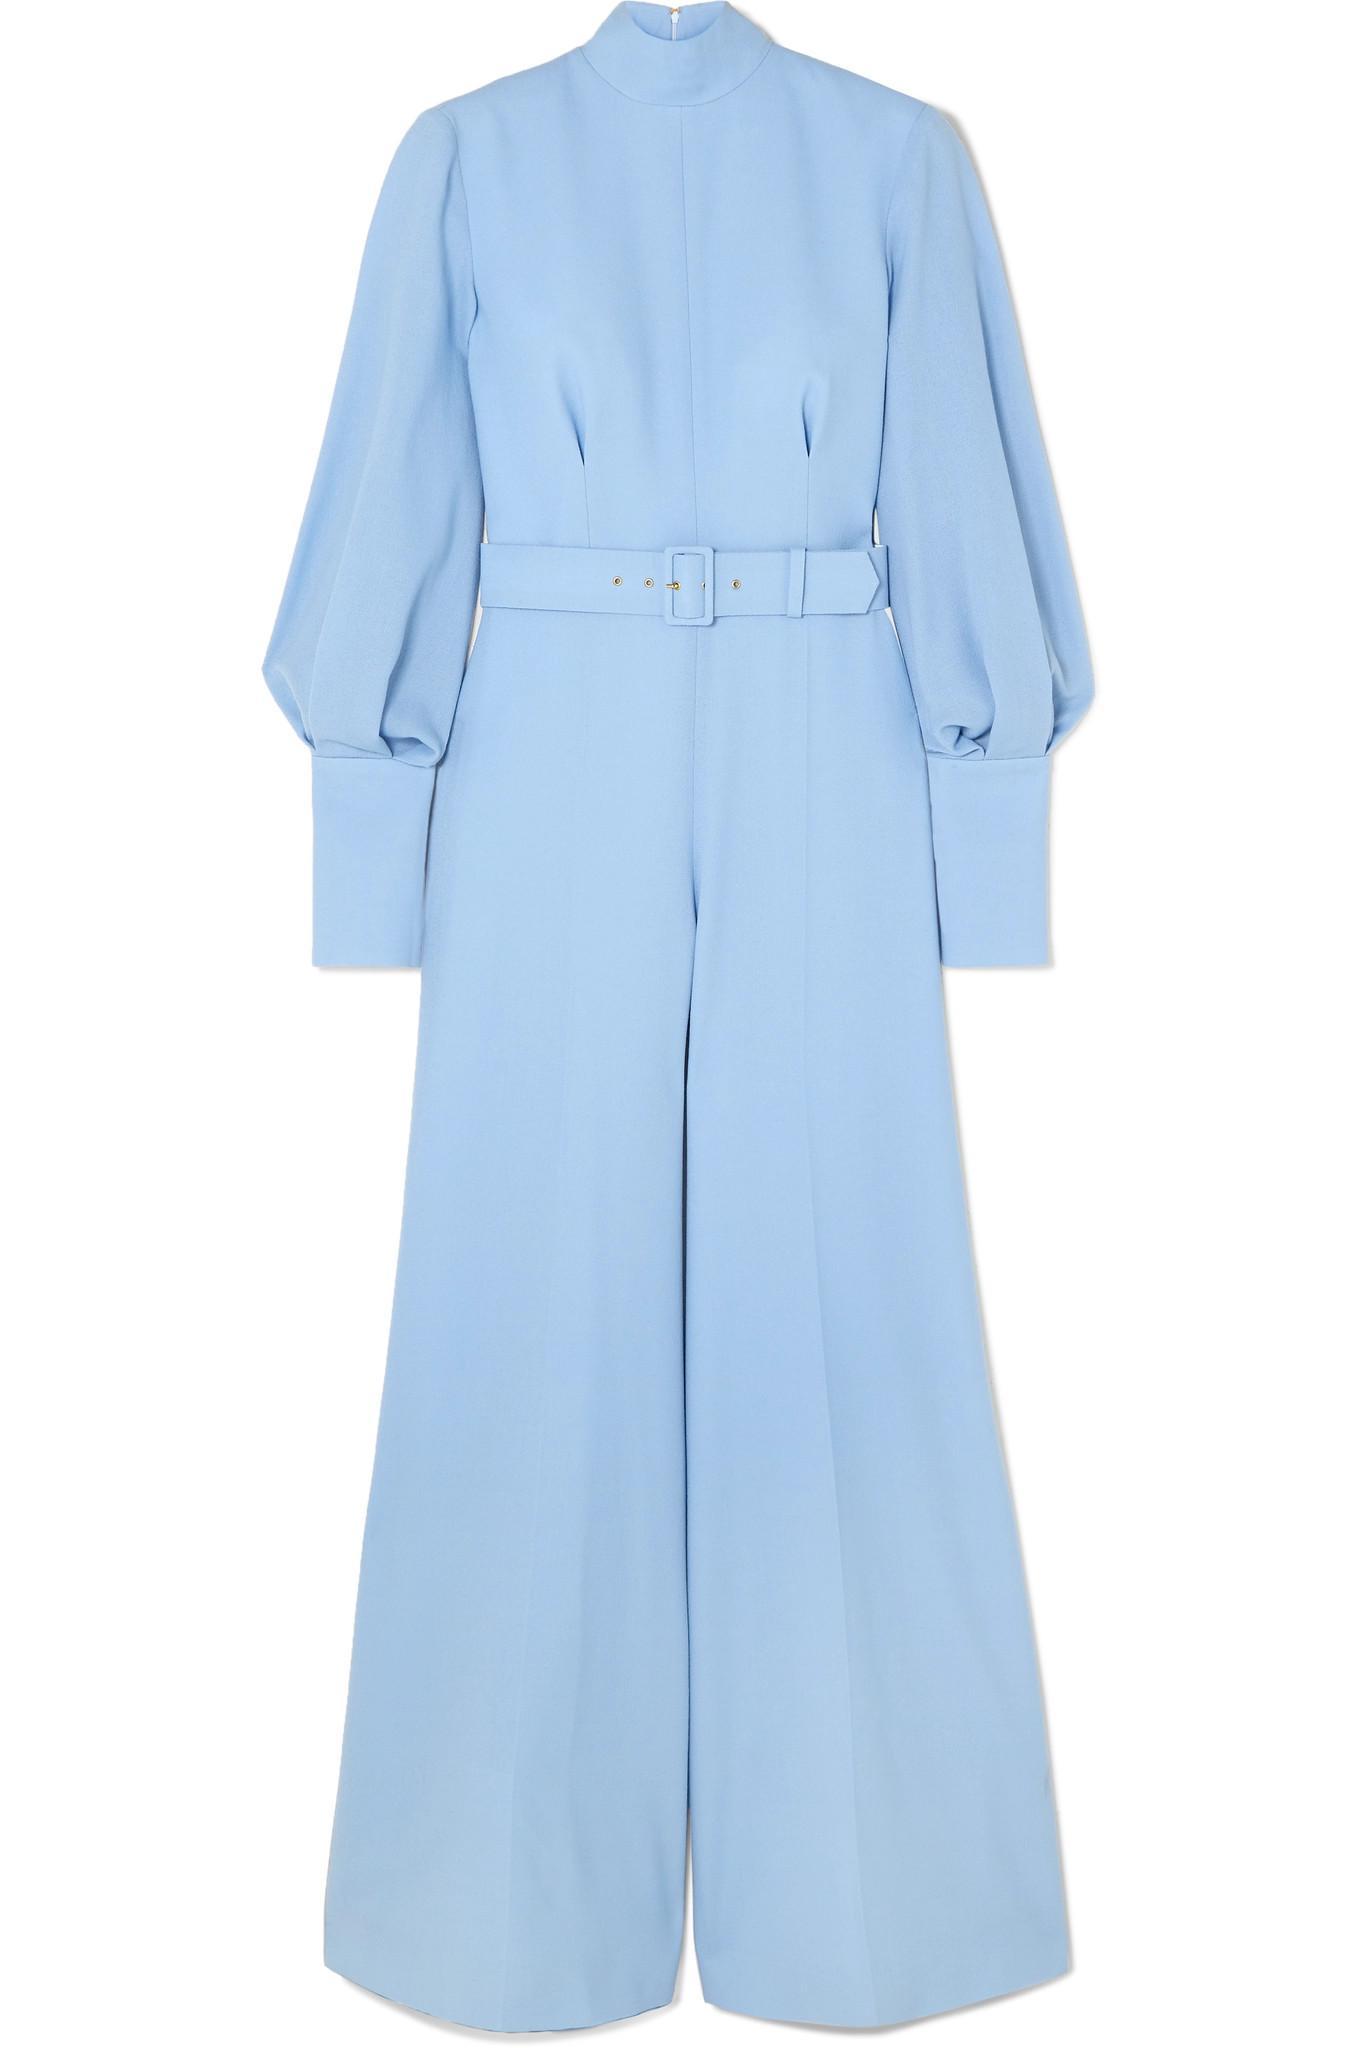 099dc6bb90 Lyst - Emilia Wickstead Elvis Belted Wool-crepe Jumpsuit in Blue ...